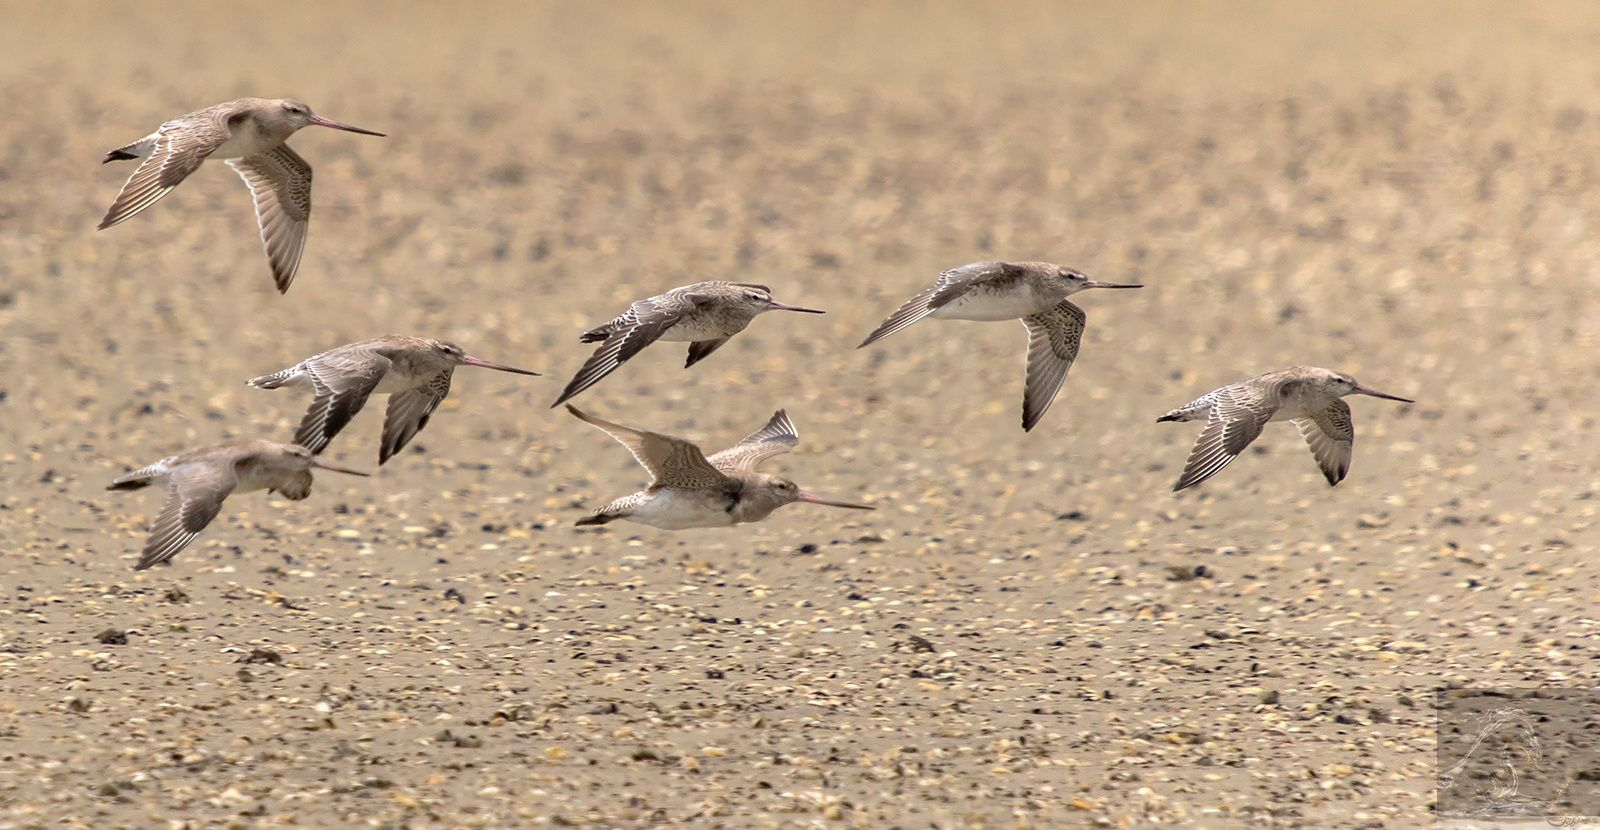 Bartailed godwits in flight nz tailed bar